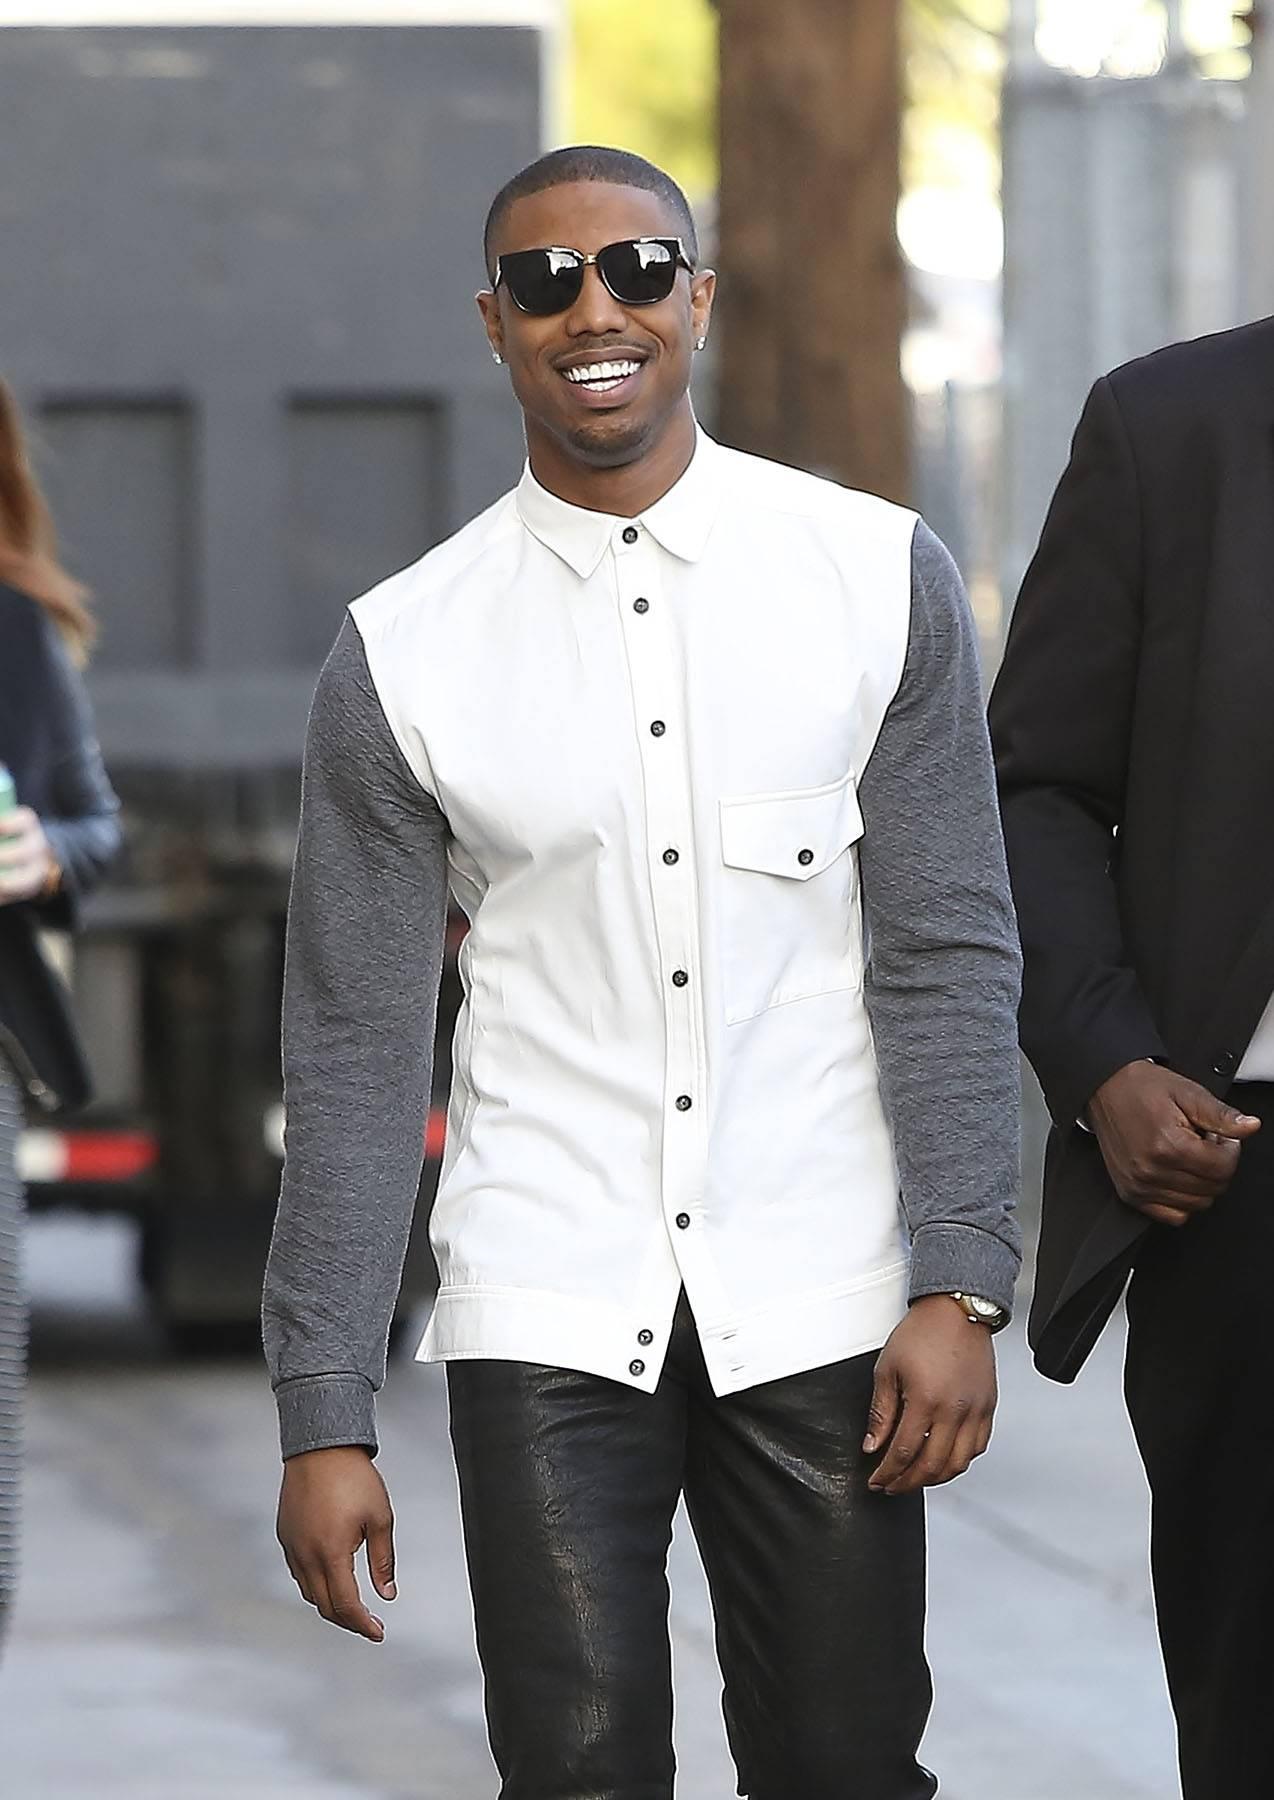 Michael B.'s I'm Having a Good Time Face - (Photo: Splash News)